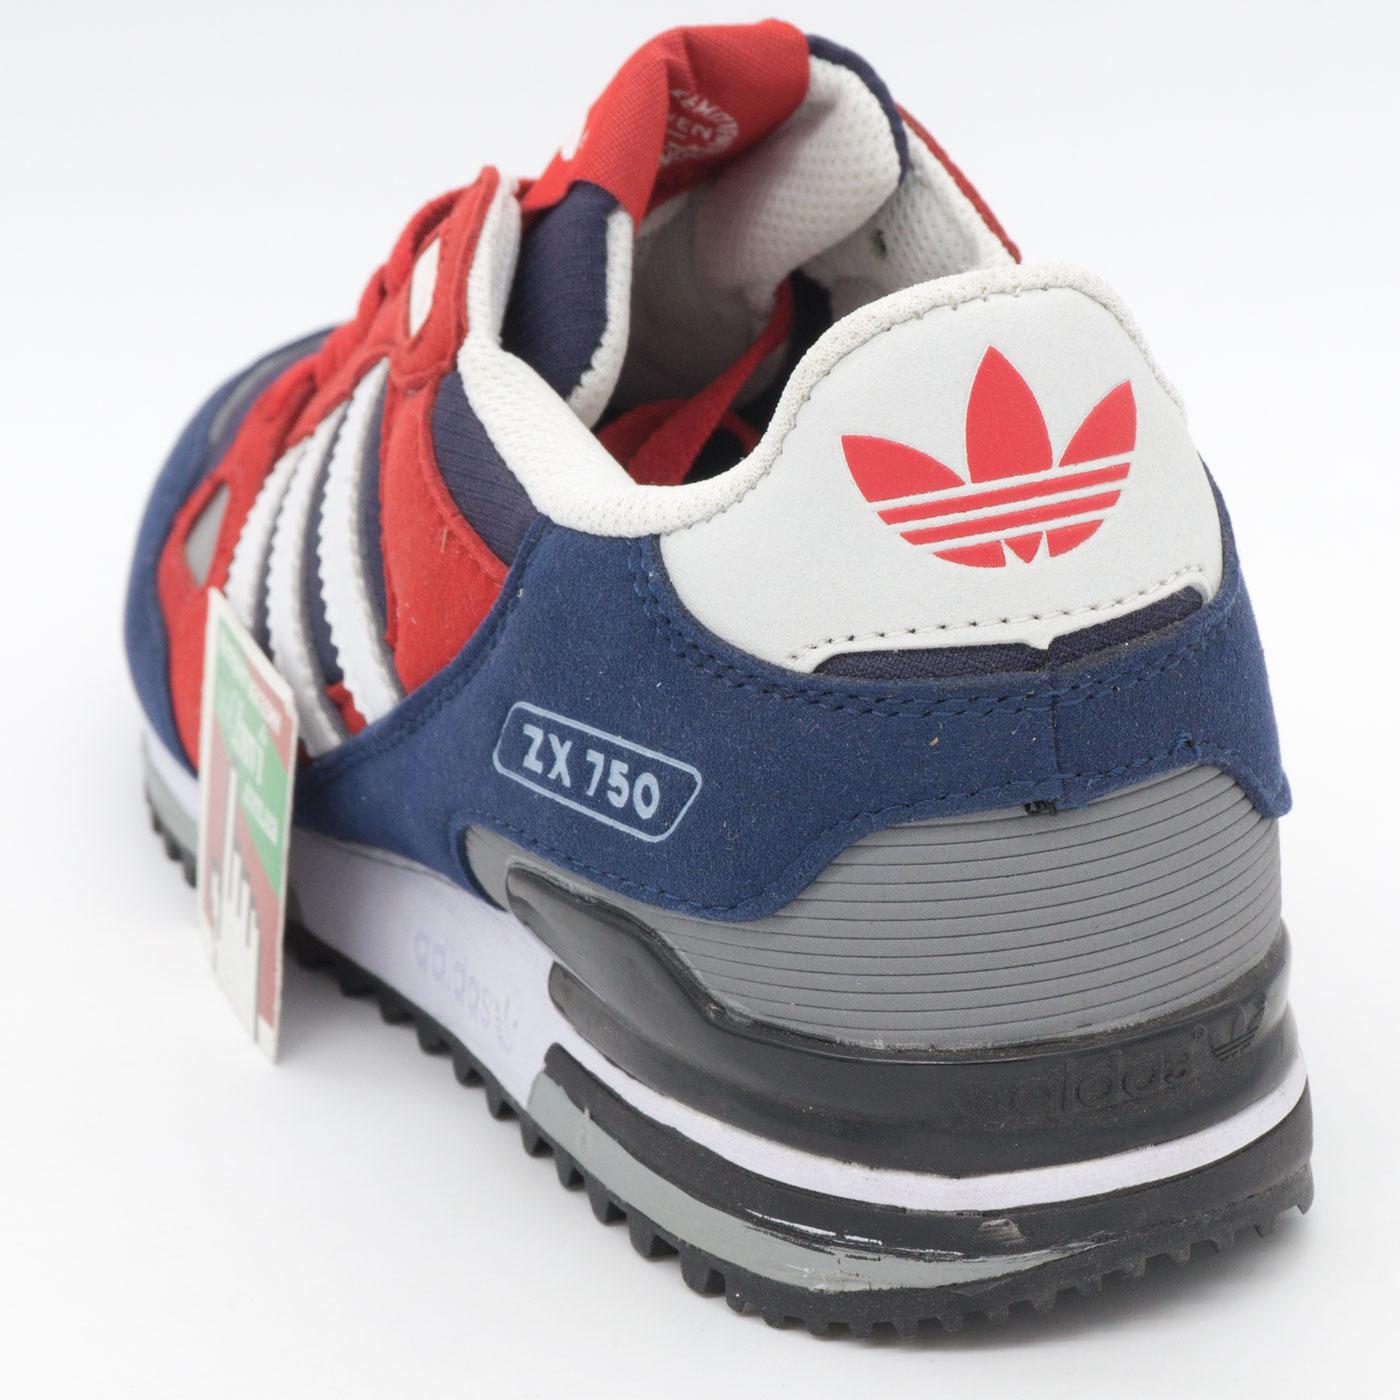 фото back Мужские кроссовки Adidas zx750 синие с красным - Топ качество! back